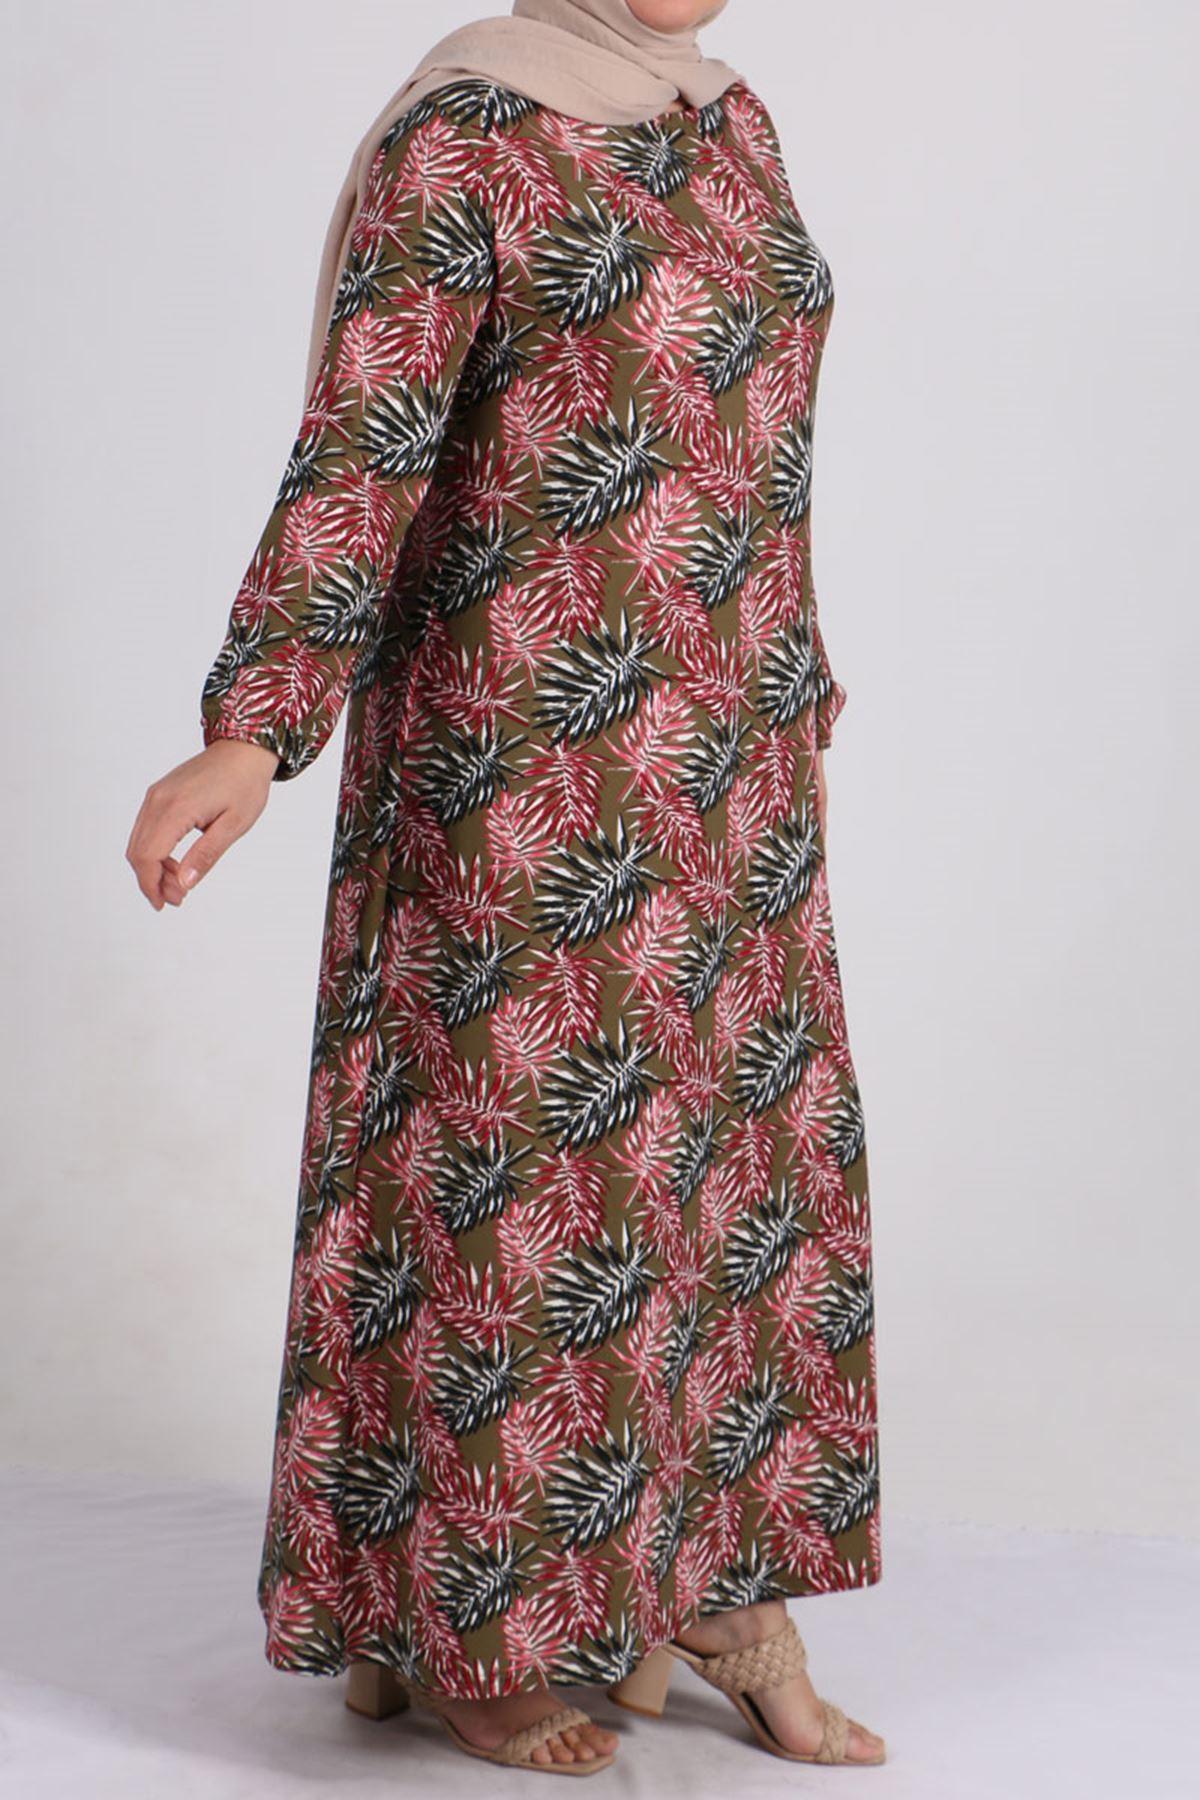 2093 Plus Size Knitted Crepe Sleeve Elastic Dress - Pink Leaf Patterned